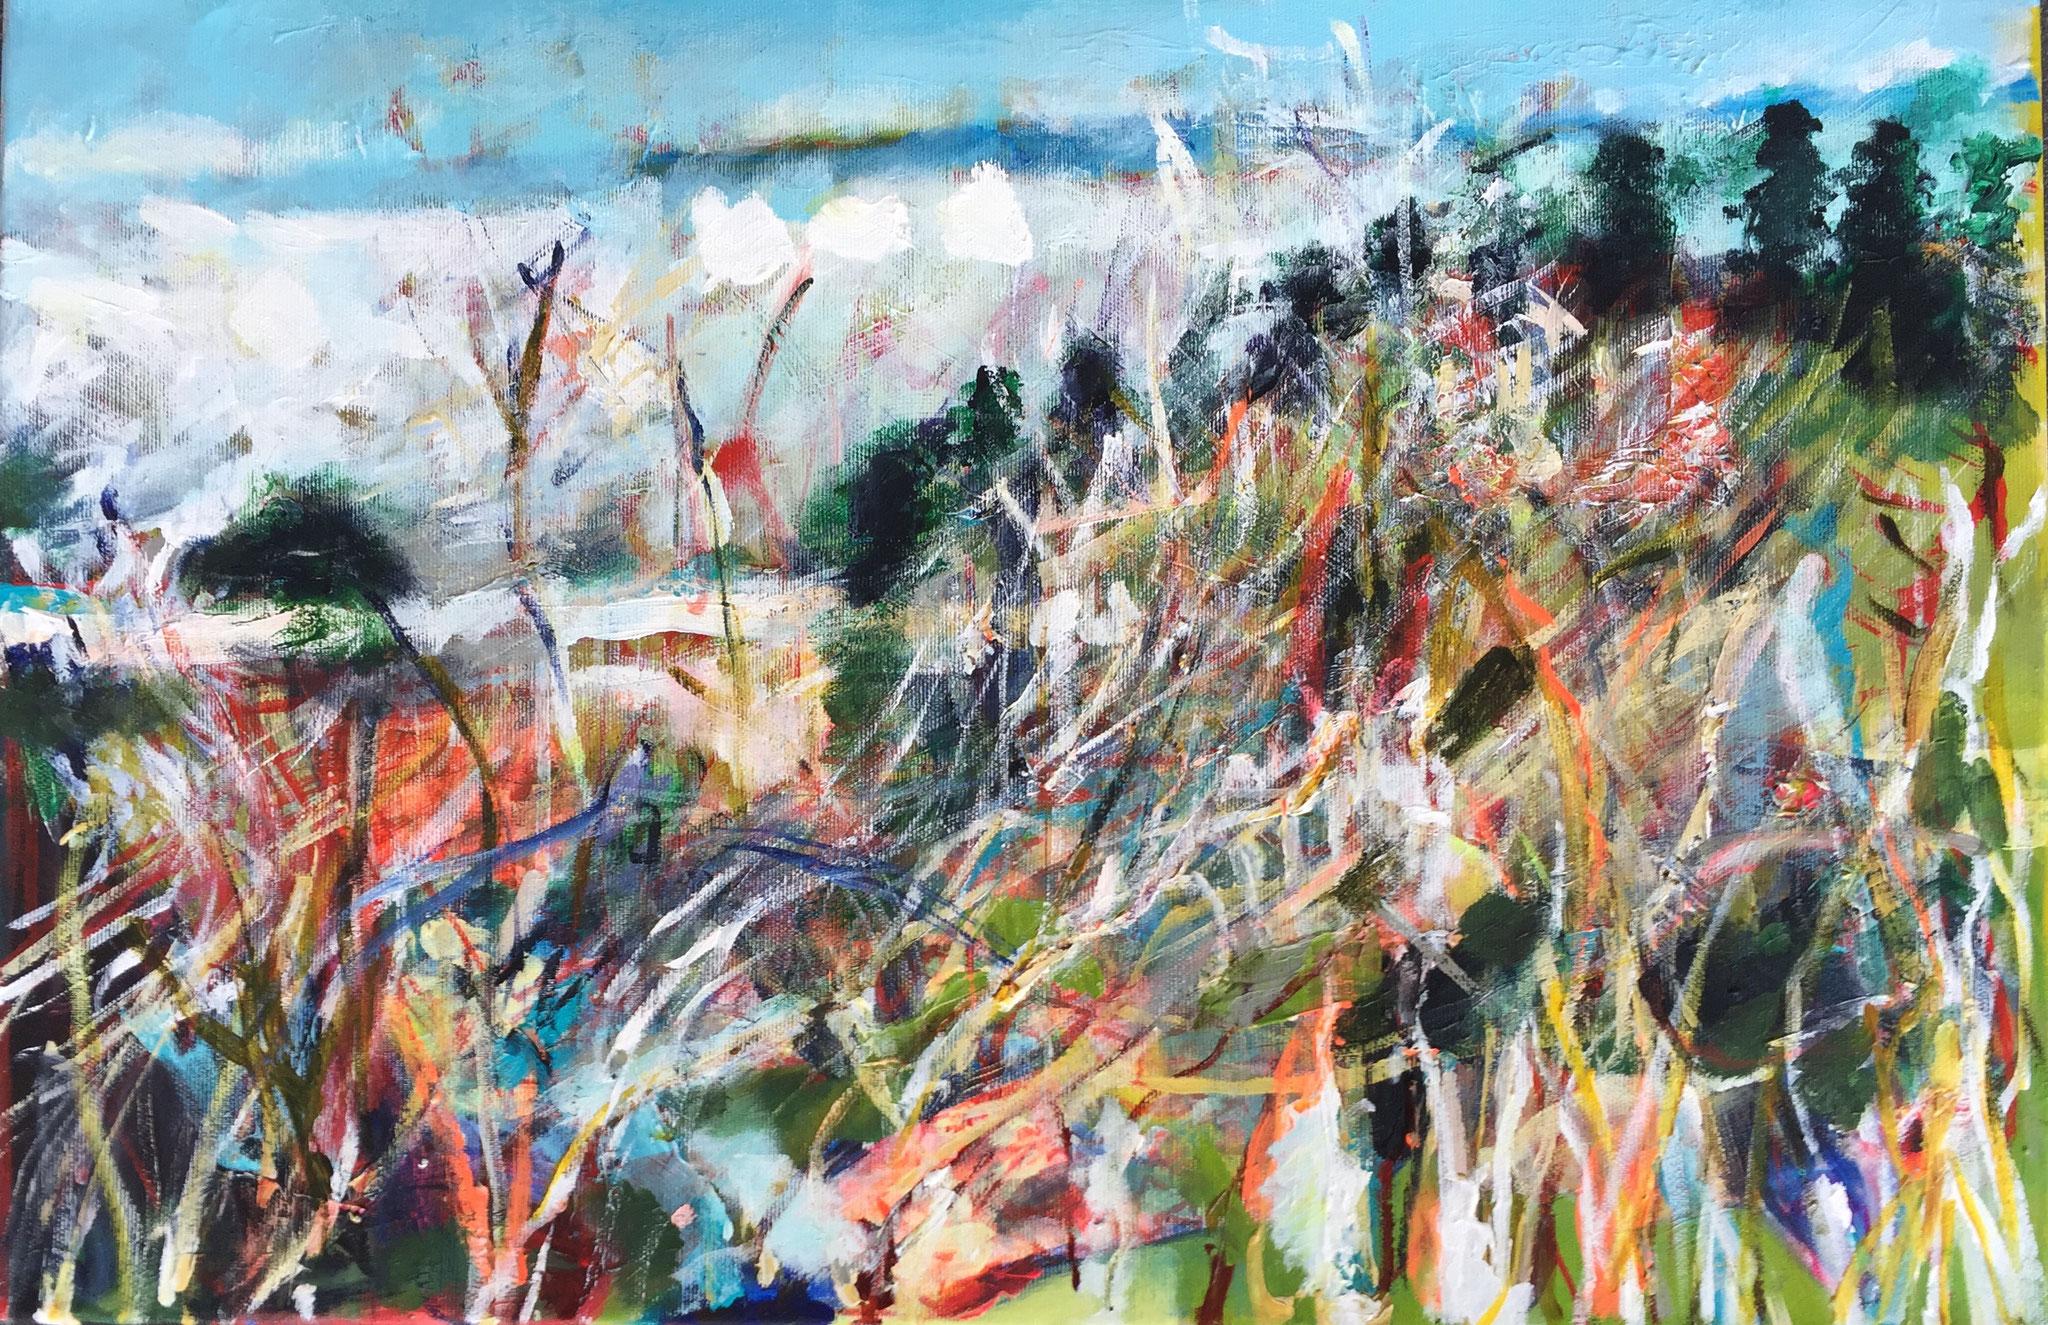 Winter 4, 40x60 acrylic on canvas